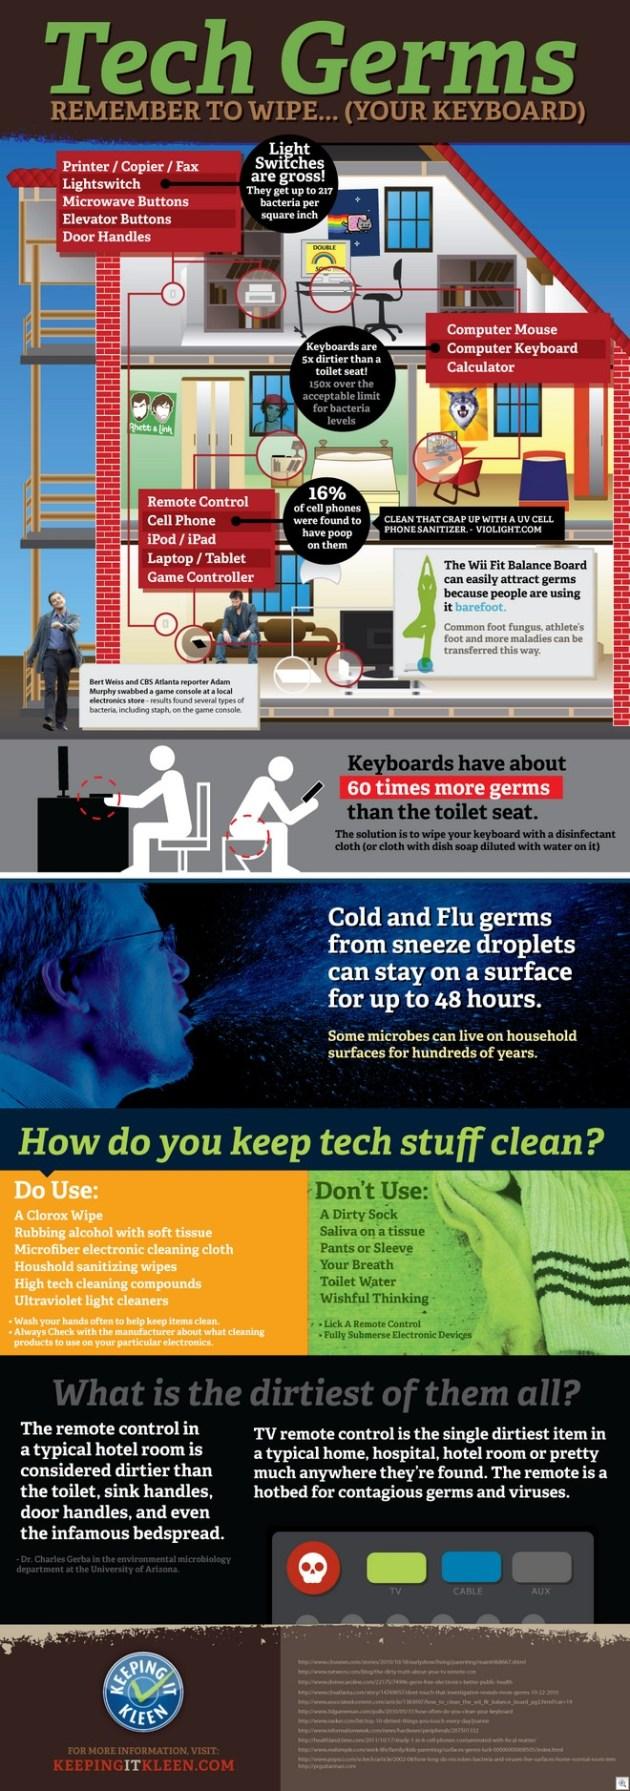 Tech-germs